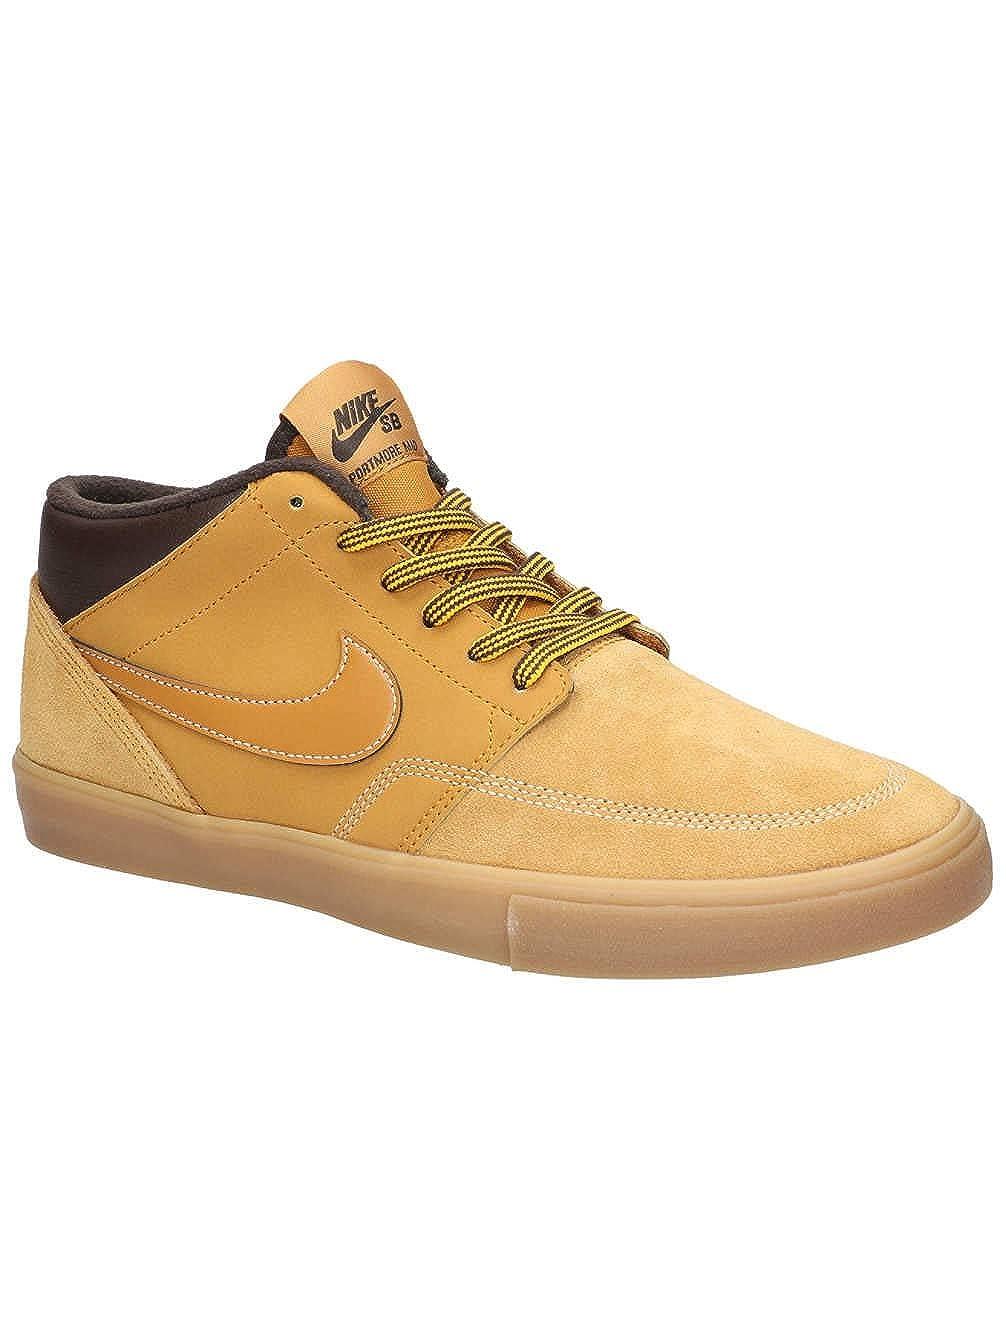 Nike Unisex-Erwachsene Sb Portmore Ii SLR M Bota Skateboardschuhe braun